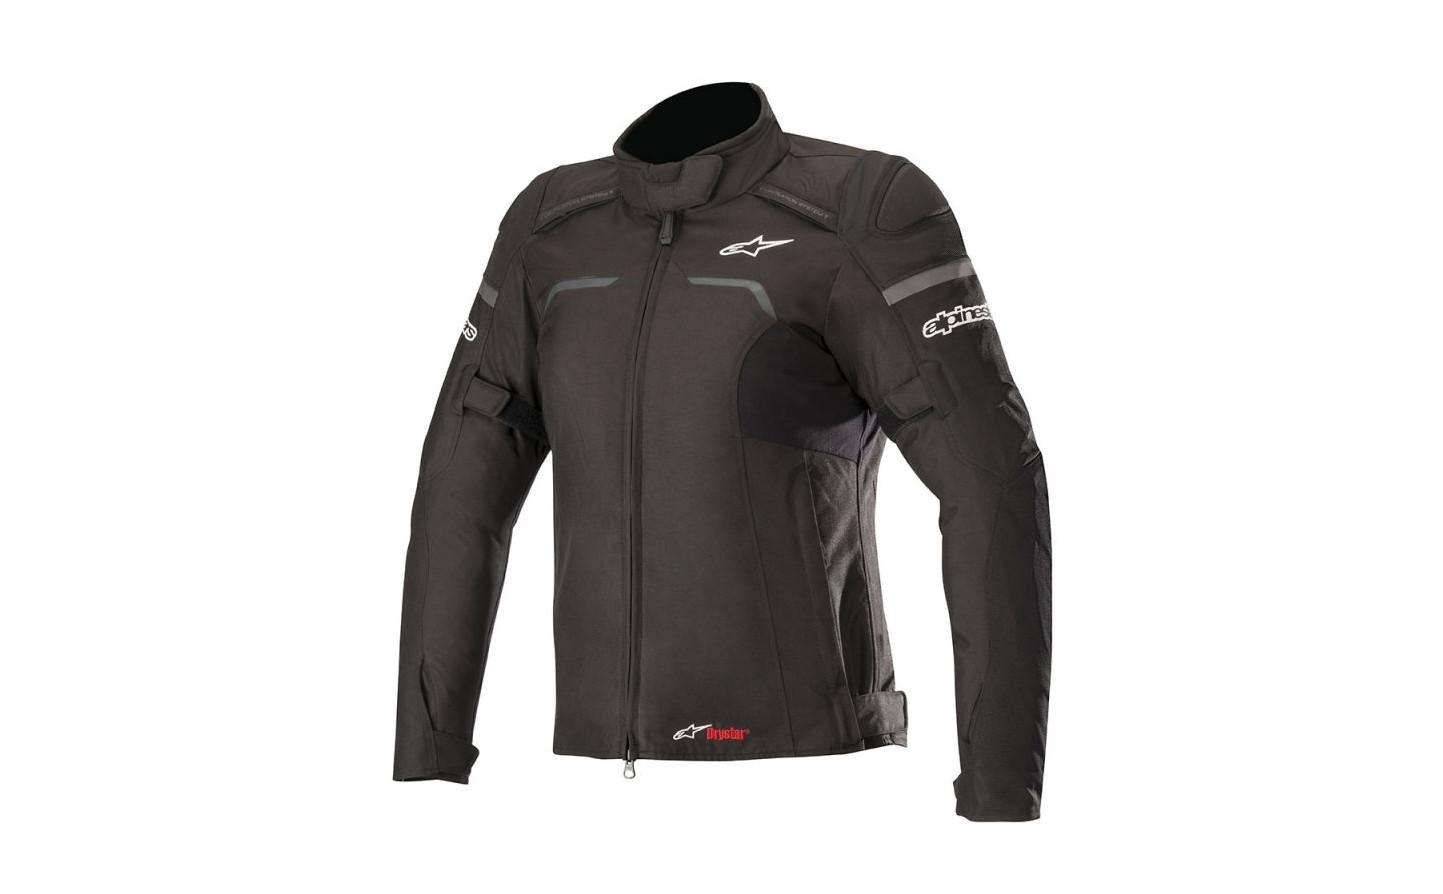 f9dcce04366 Chaqueta Mujer Alpinestars Stella Hyper Drystar Jacket Negro ...